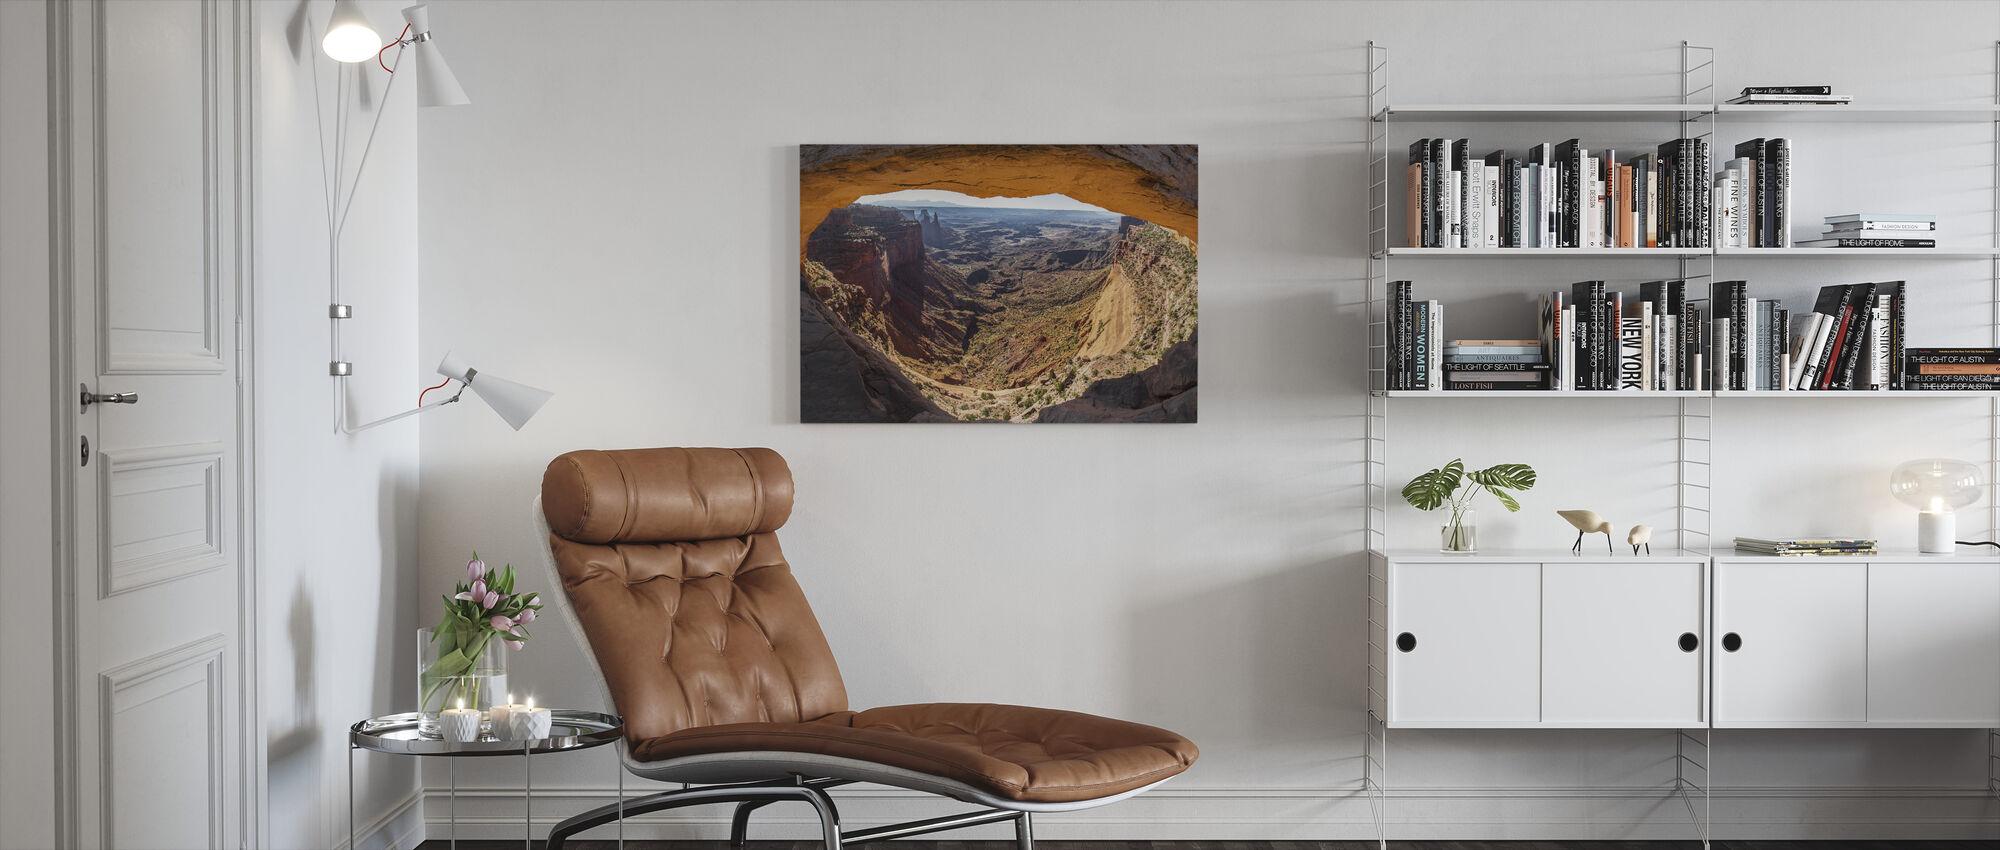 Mesa Arch - Canvas print - Living Room